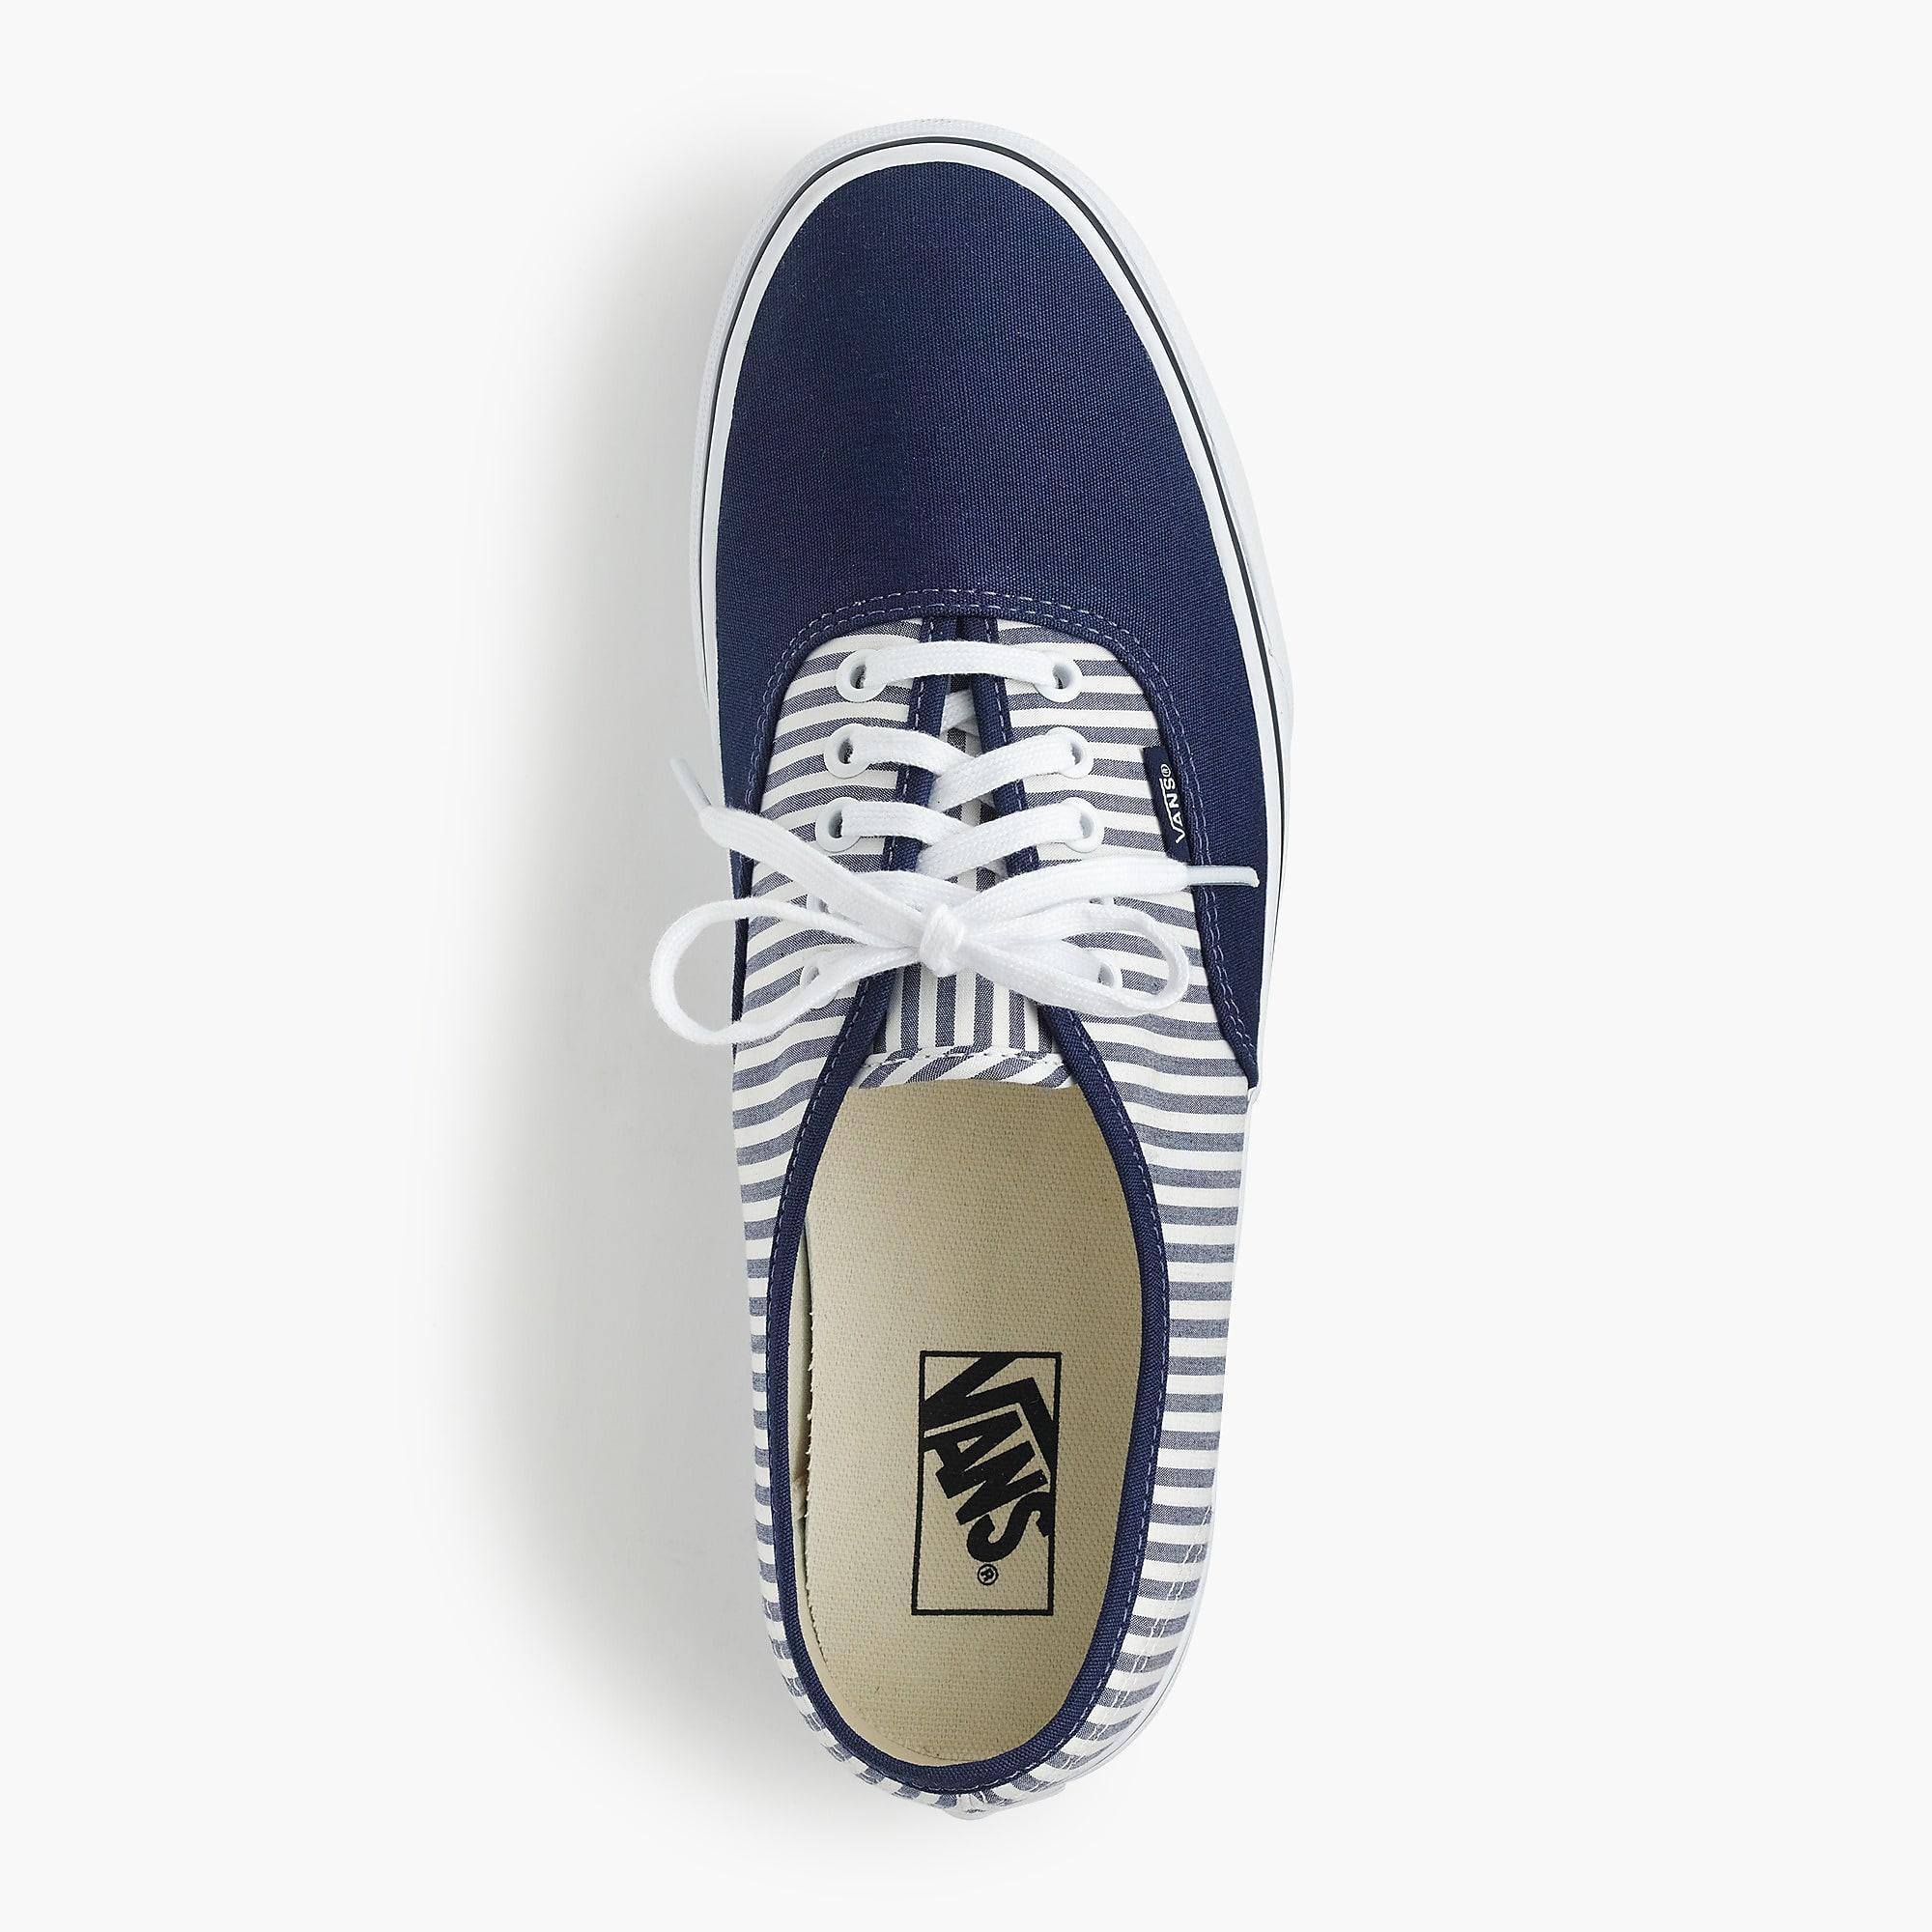 d67f867a44540c Vans - Blue Authentic Sneakers In Seersucker Stripe for Men - Lyst. View  fullscreen